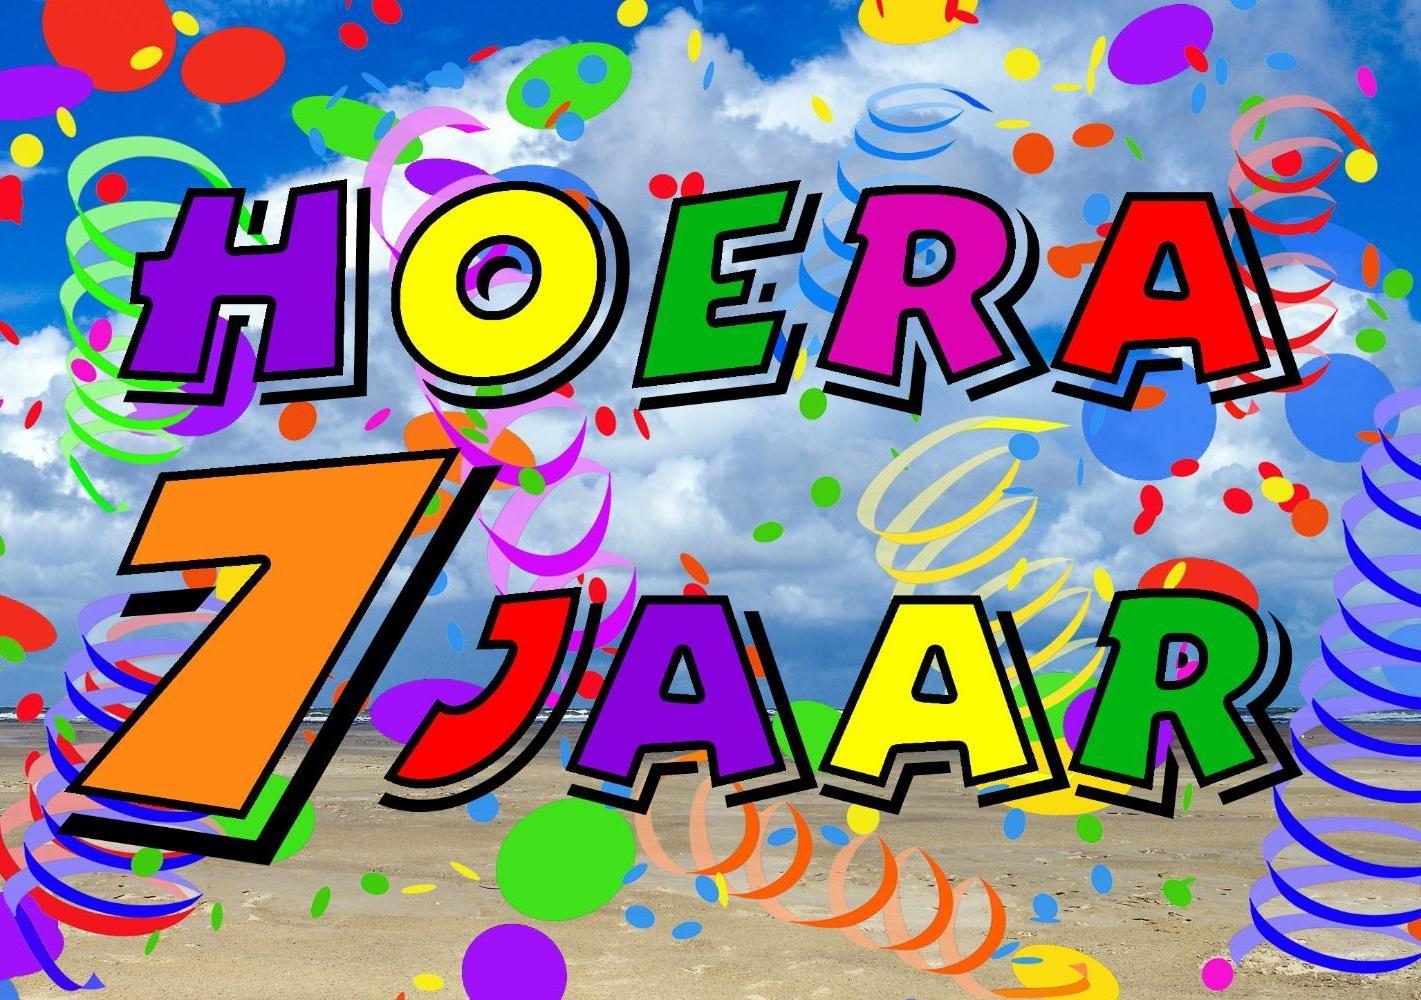 7 jaar kind Verjaardagskaart kind: Hoera 7 jaar!   Kaartjeposten.nl 7 jaar kind